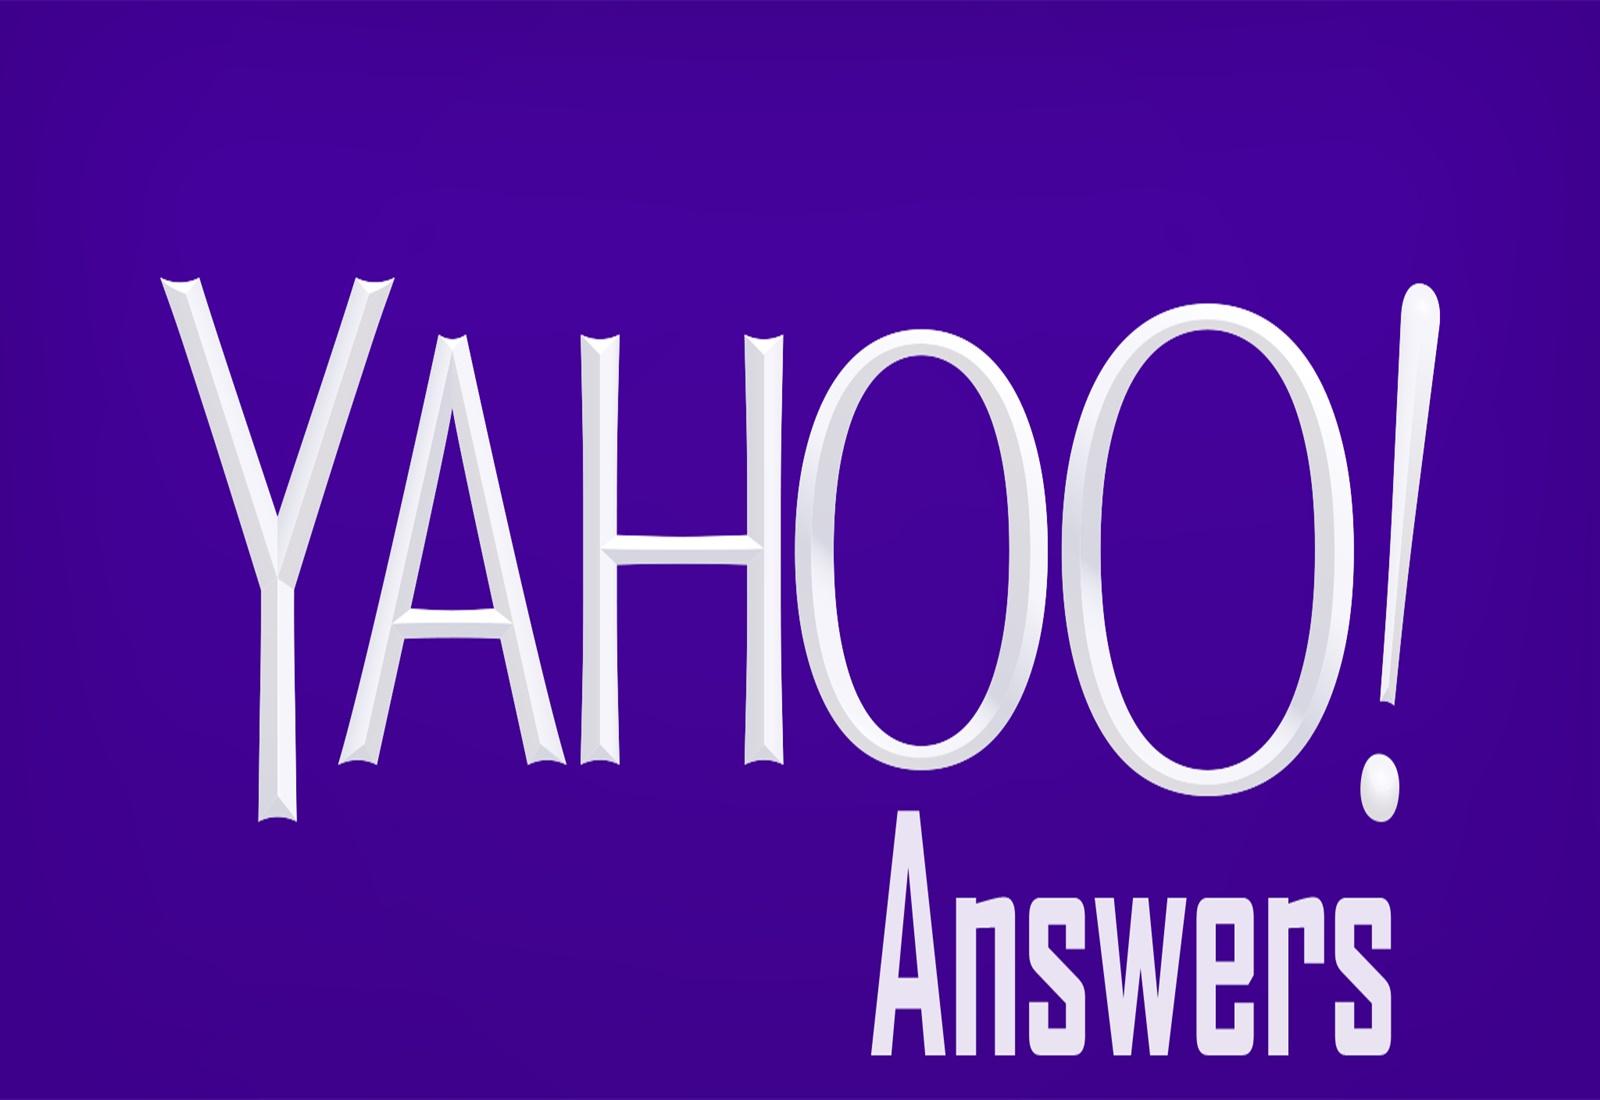 Need 10 Yahoo Answers Level 3 Accounts Job For 30 By Rumon86